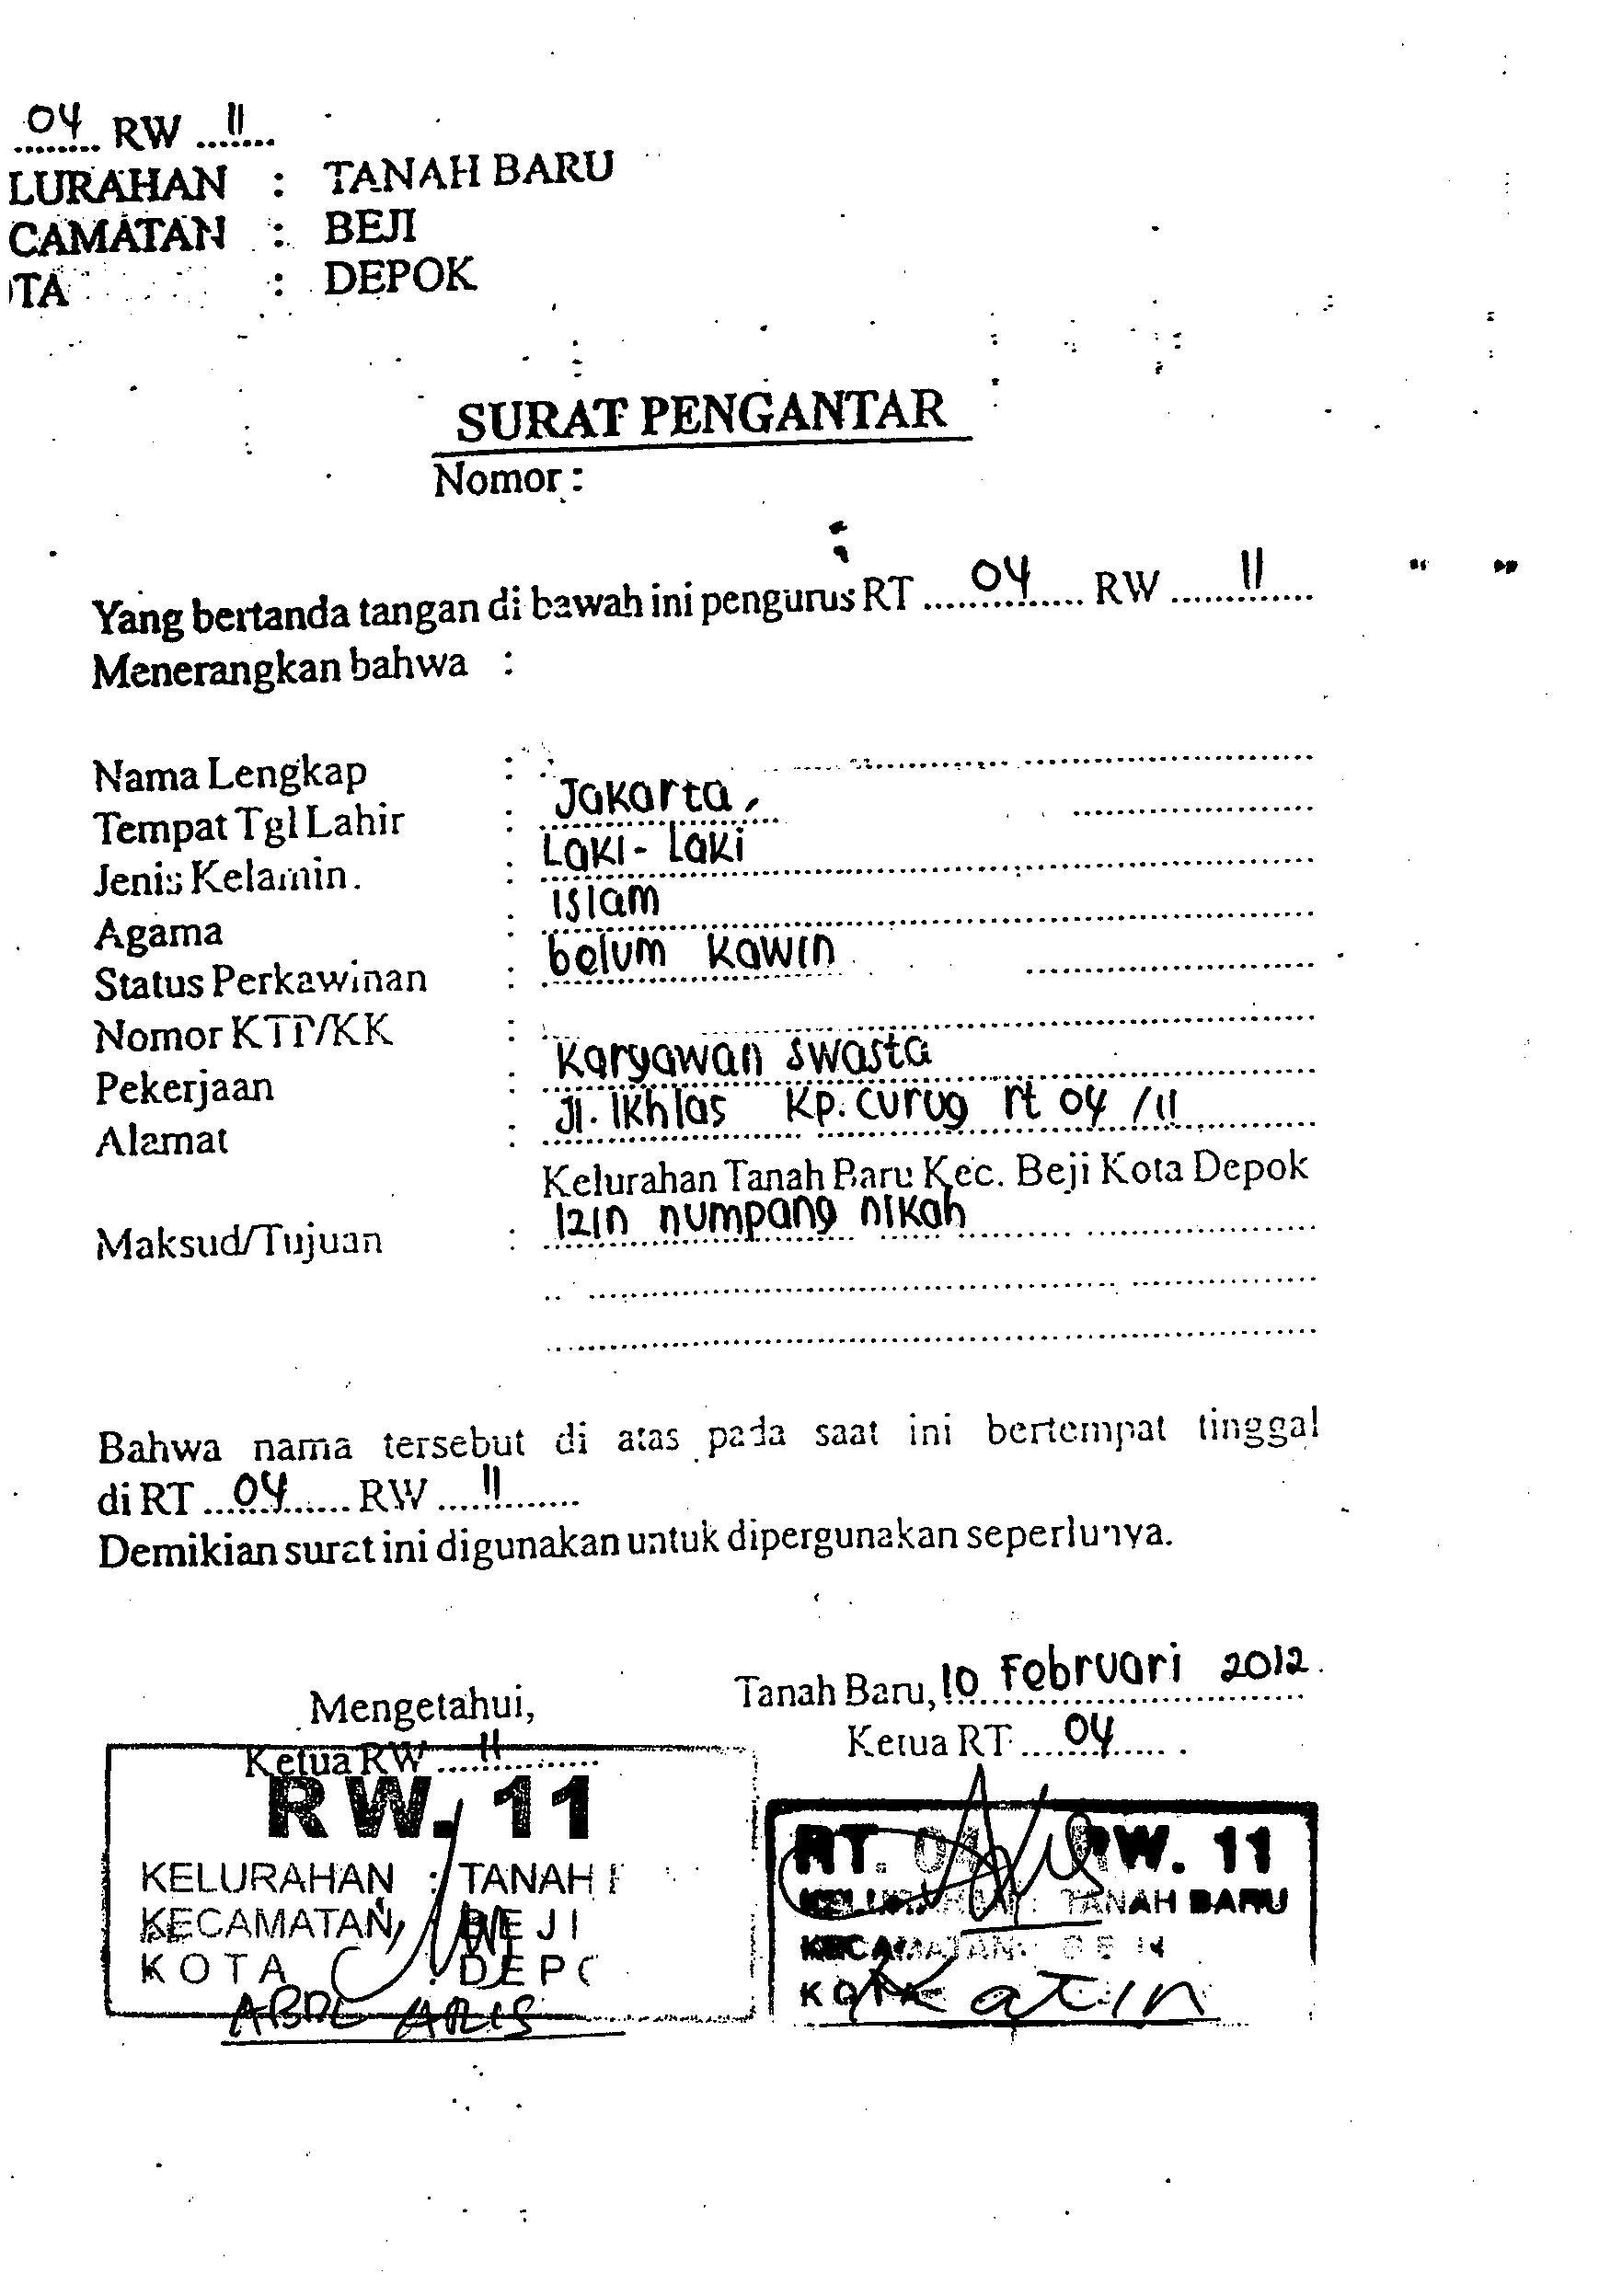 Gambar Surat Keterangan